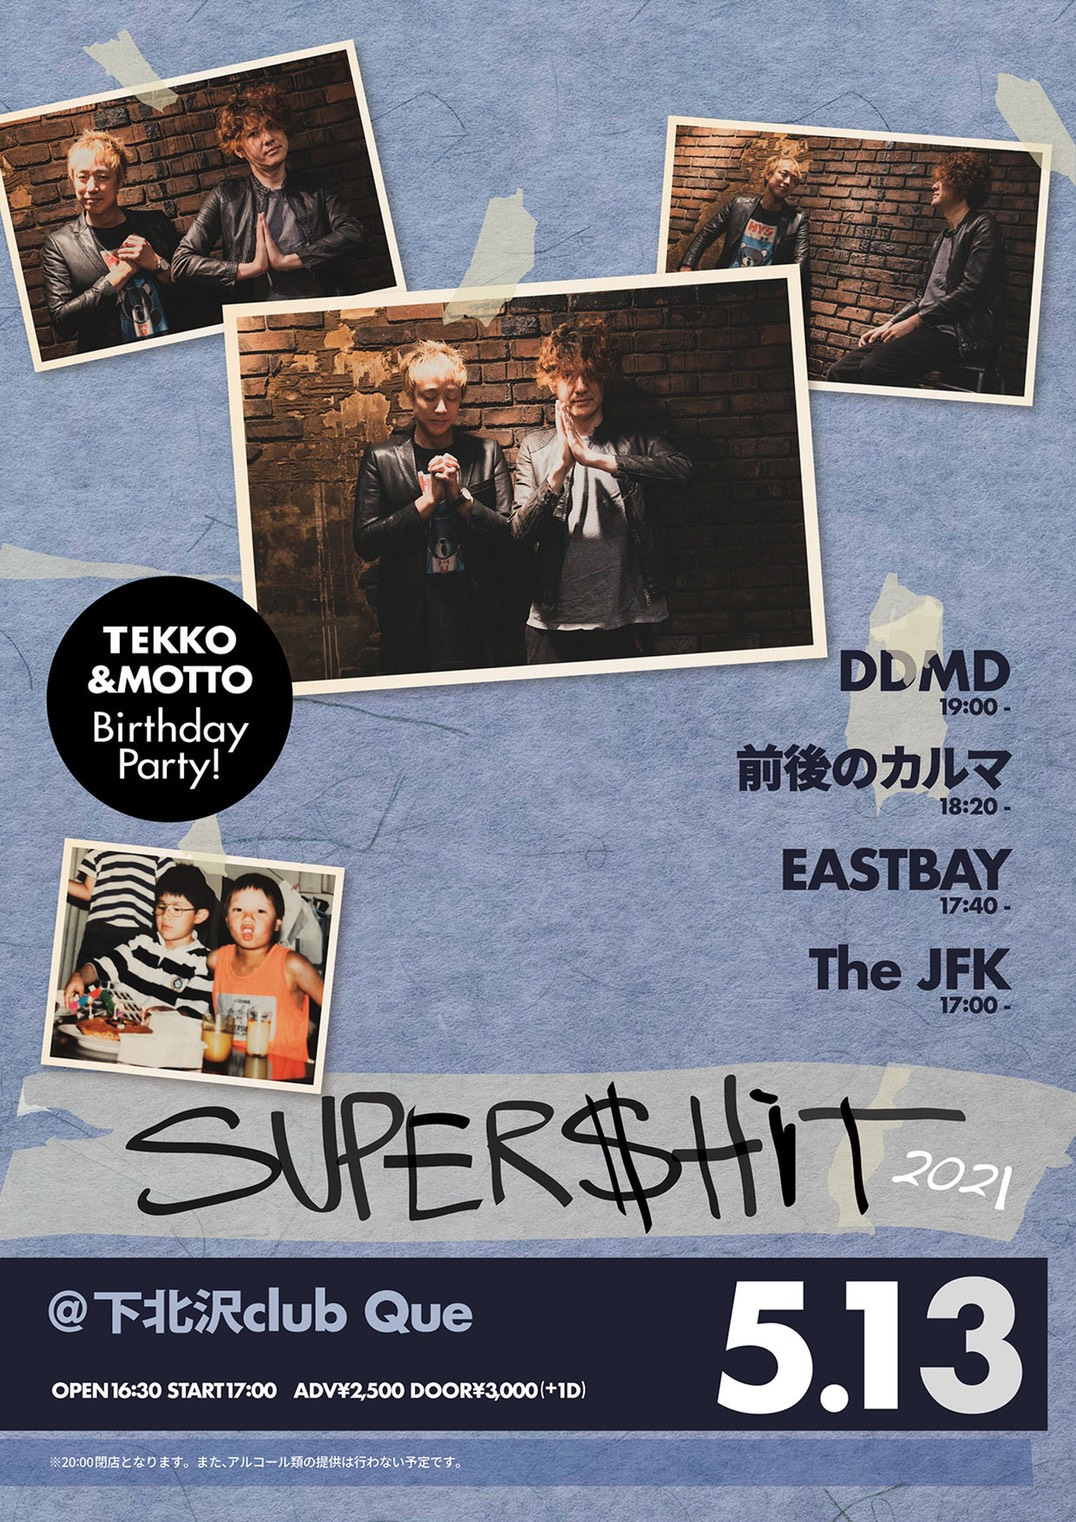 Tekko&Motto Birthday!!『SUPER SHiT 5.13』の写真